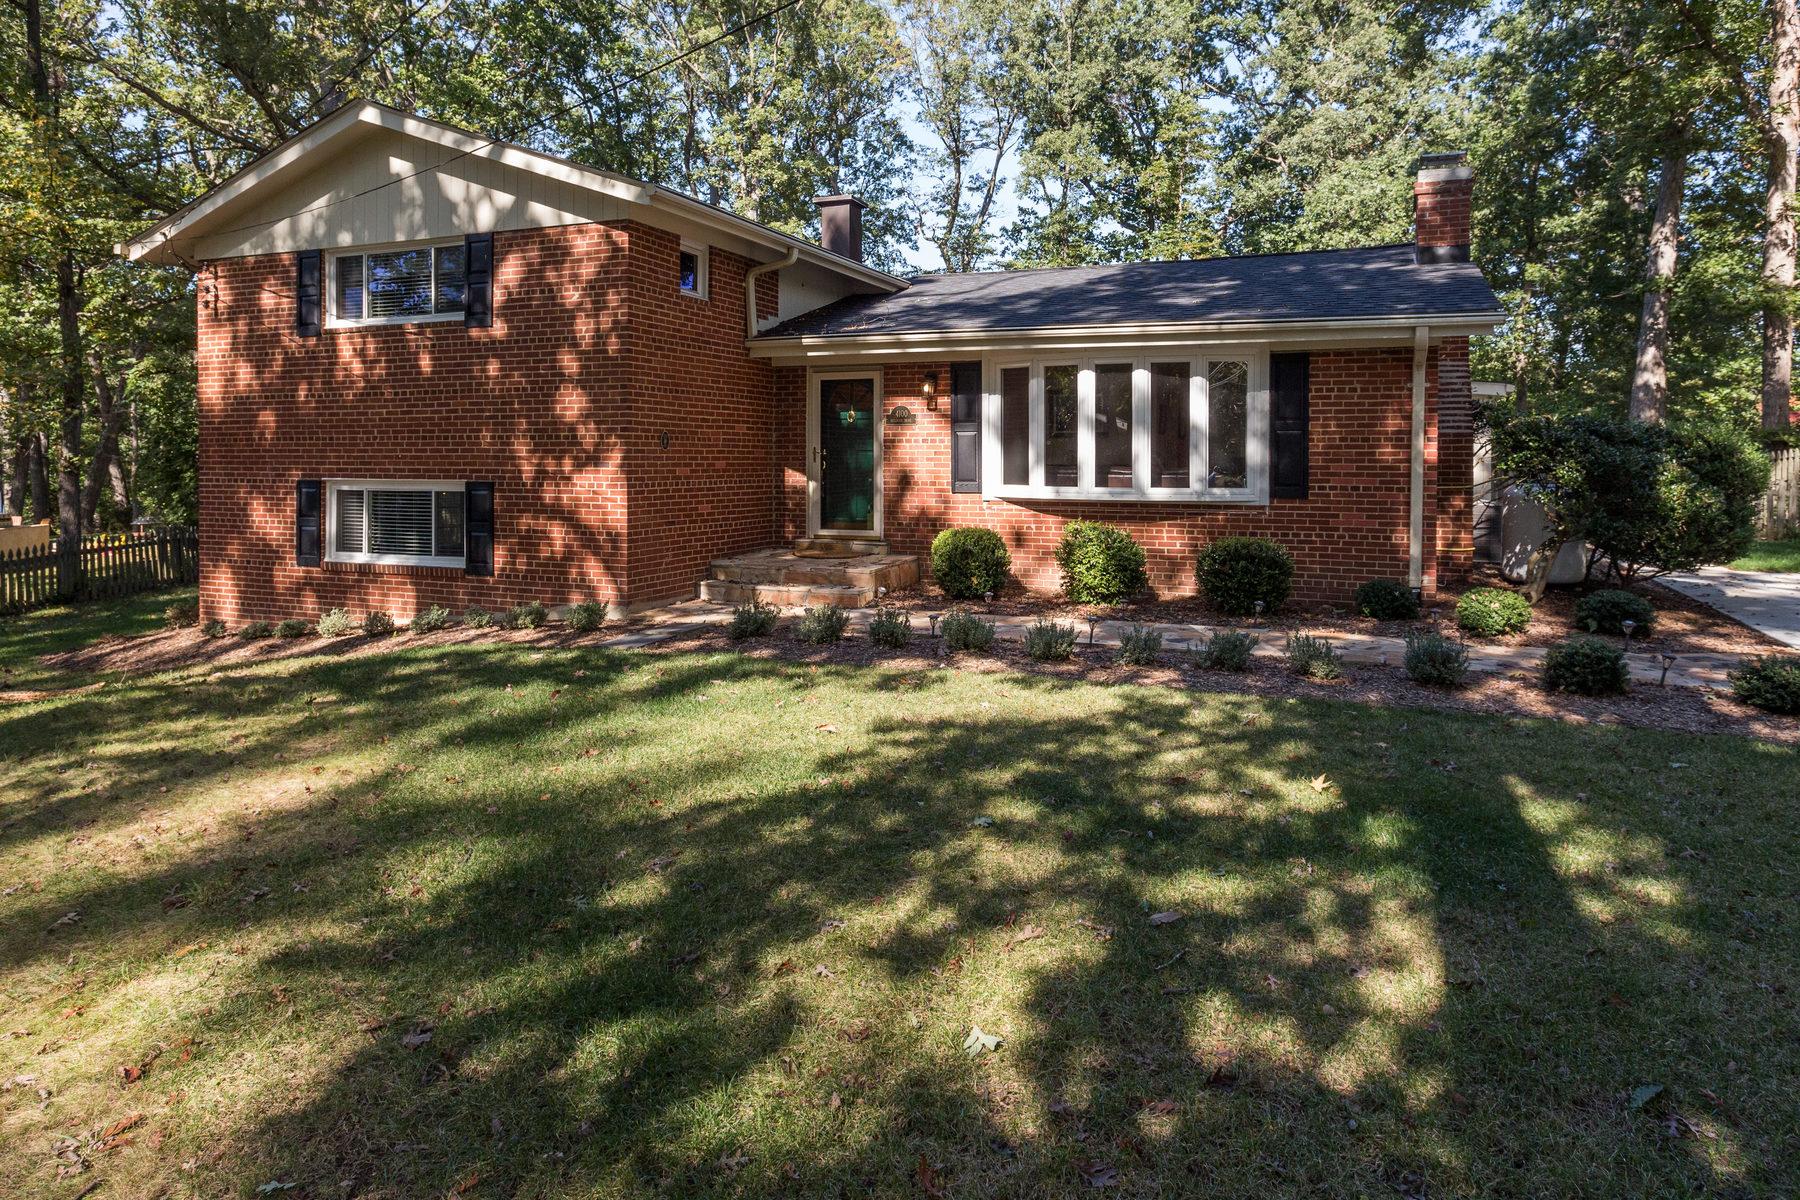 Single Family Home for Sale at 4100 Sulgrave Drive, Alexandria Alexandria, Virginia 22309 United States